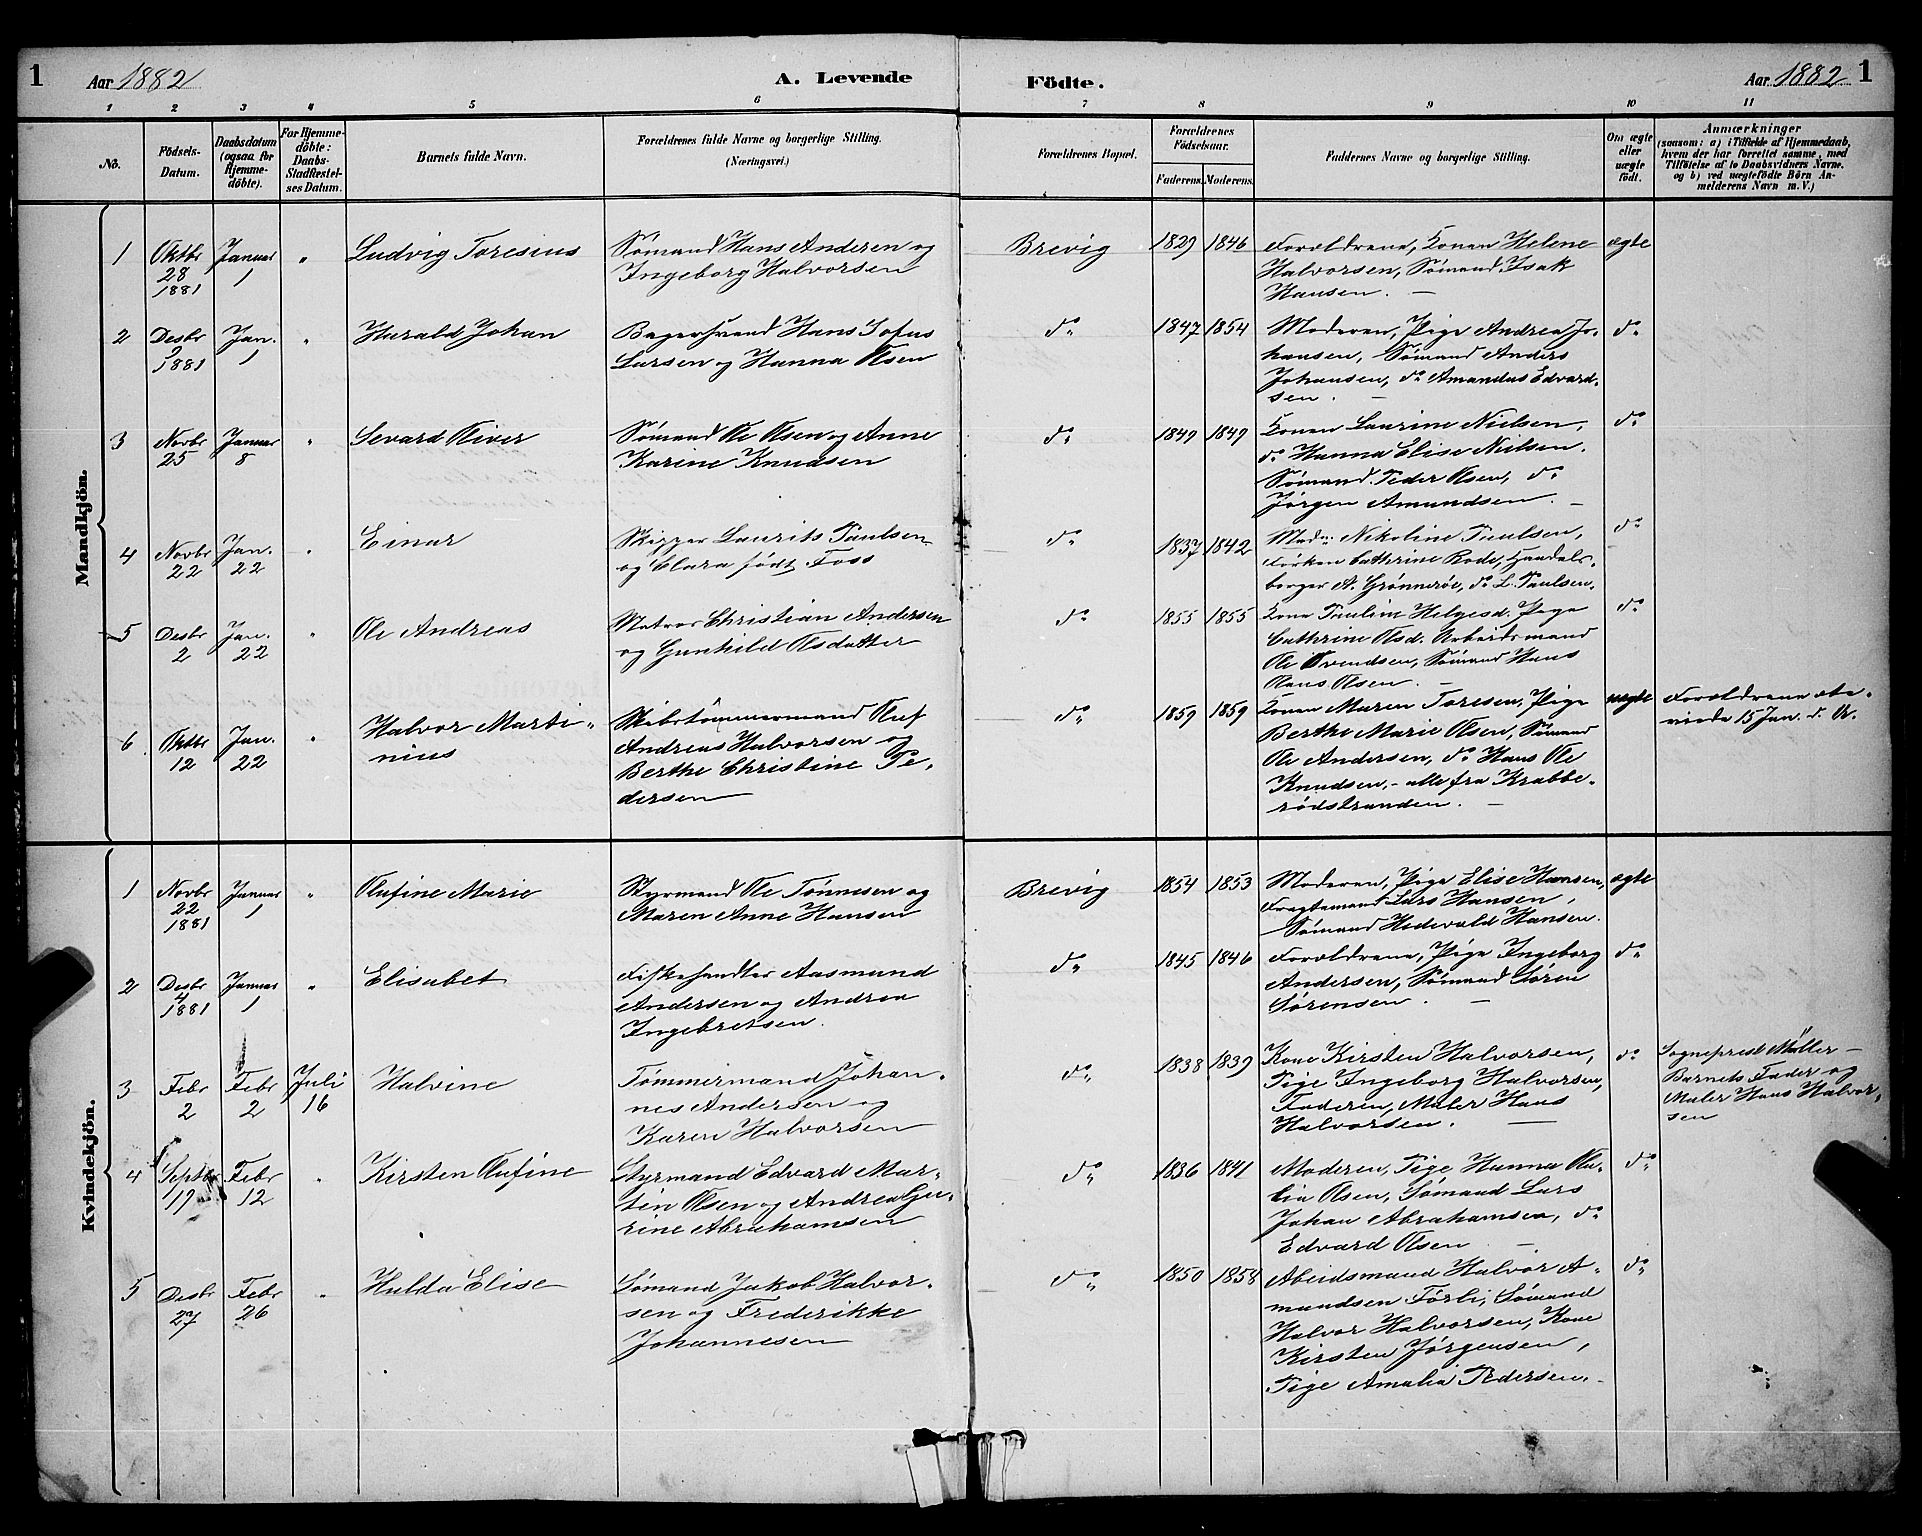 SAKO, Brevik kirkebøker, G/Ga/L0004: Klokkerbok nr. 4, 1882-1900, s. 1